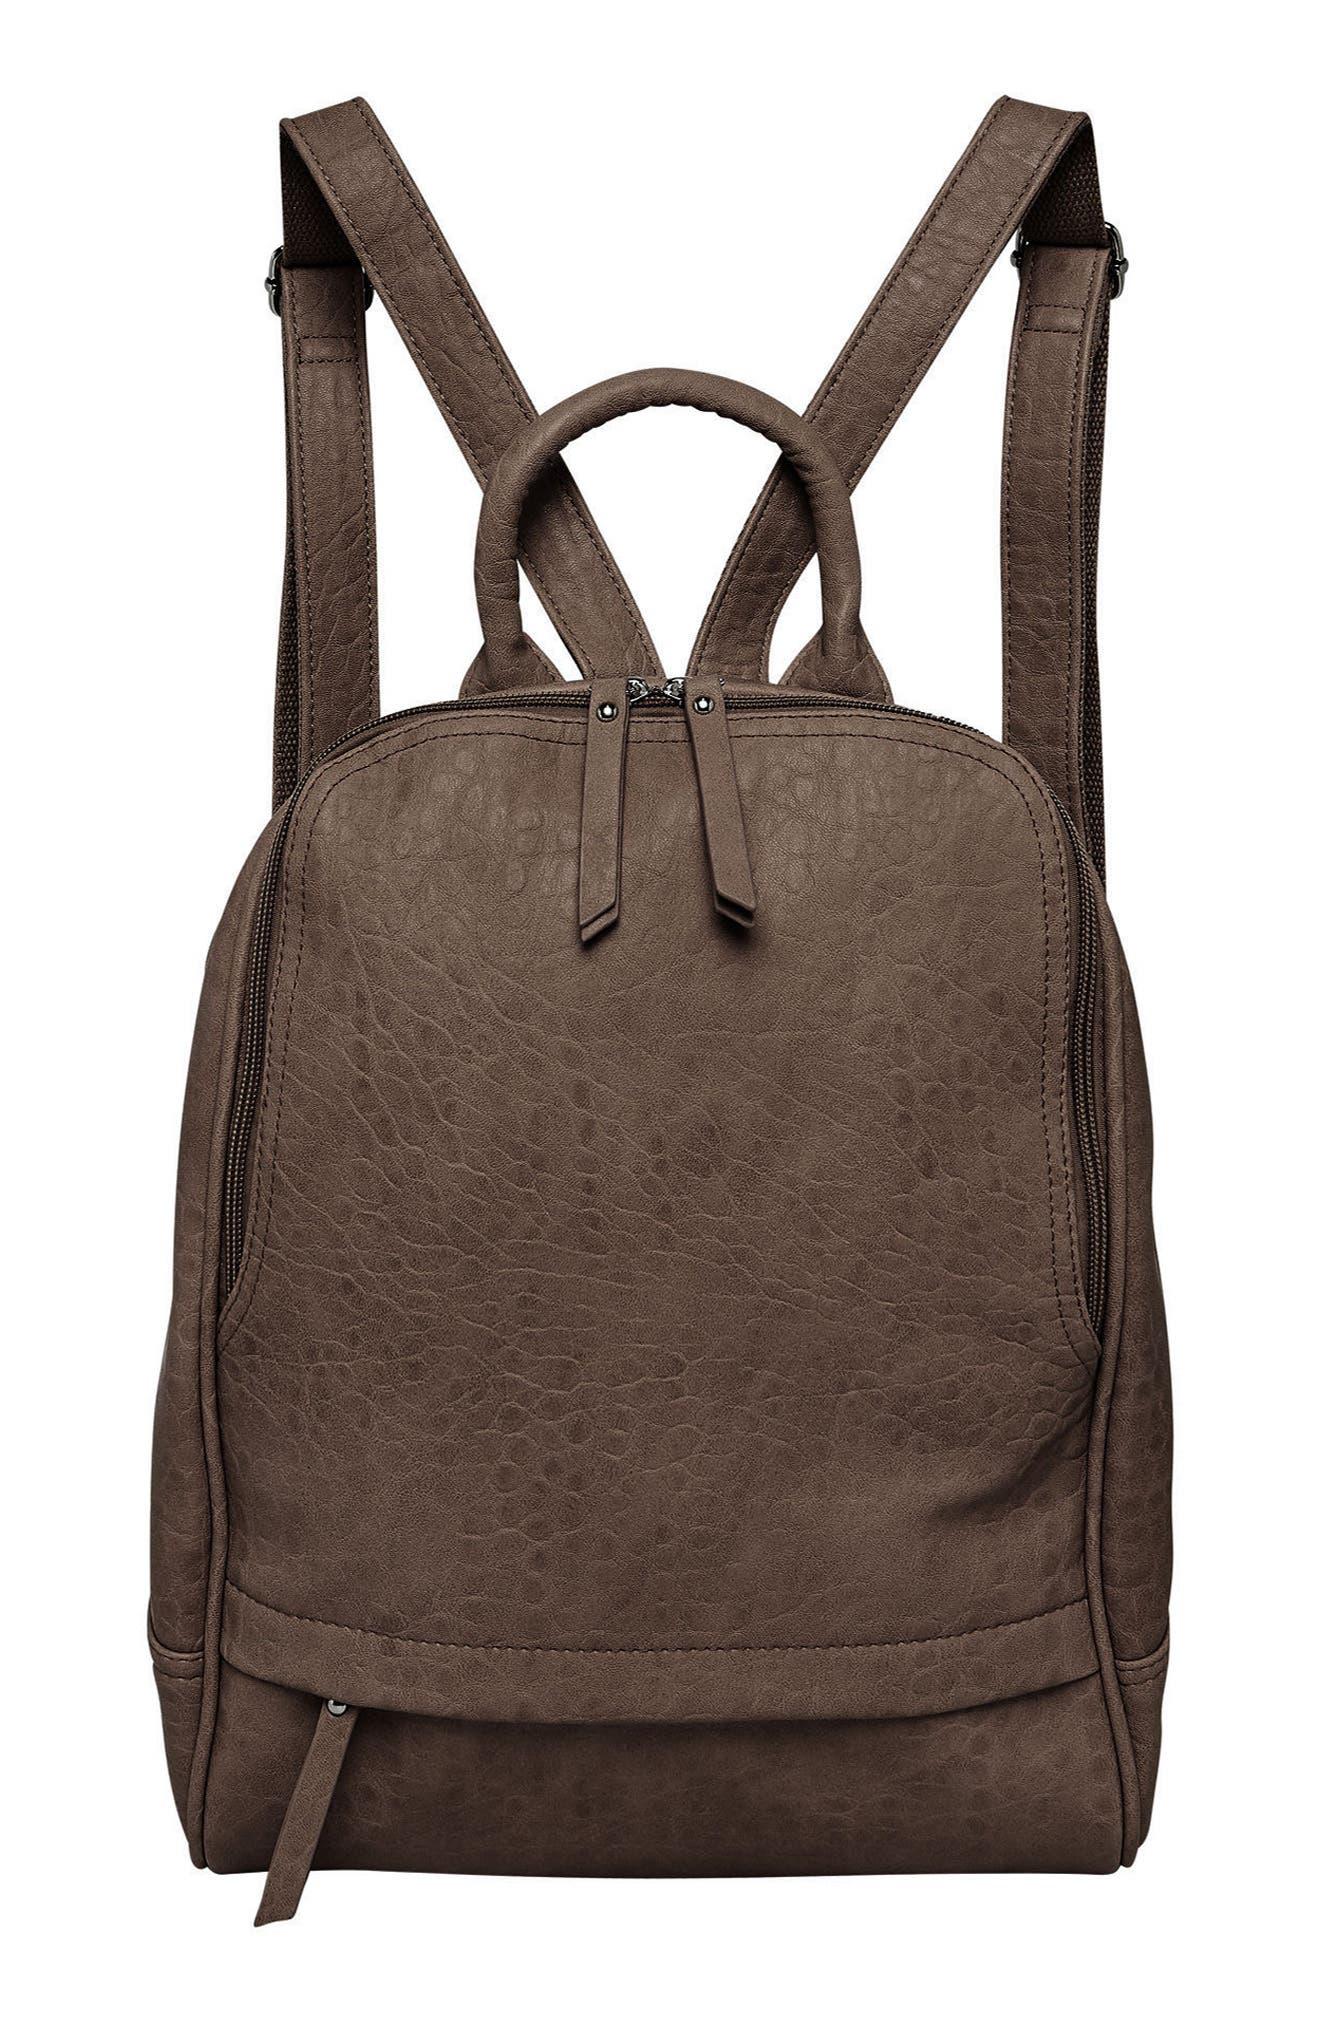 Alternate Image 1 Selected - Urban Originals My Way Vegan Leather Backpack